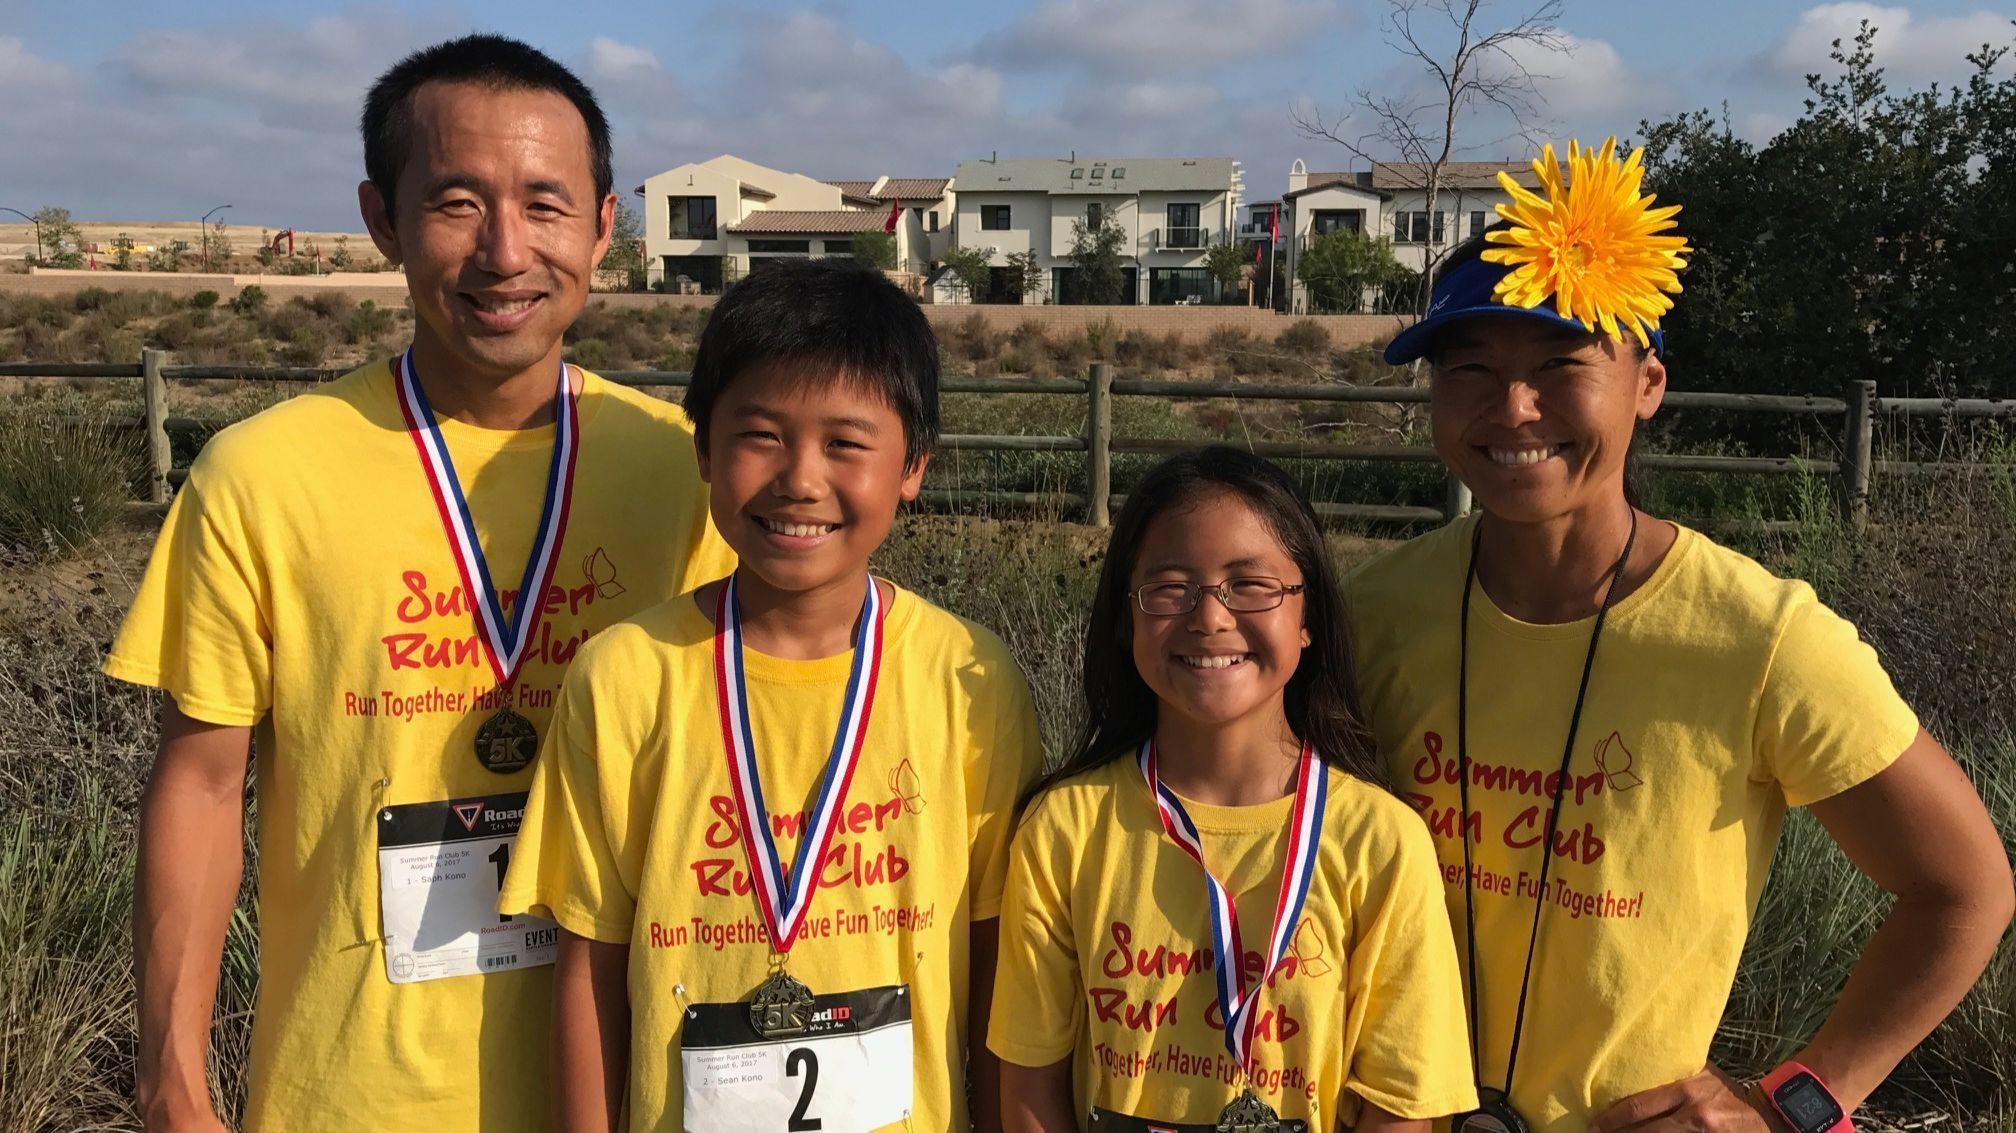 The Kono family runners.